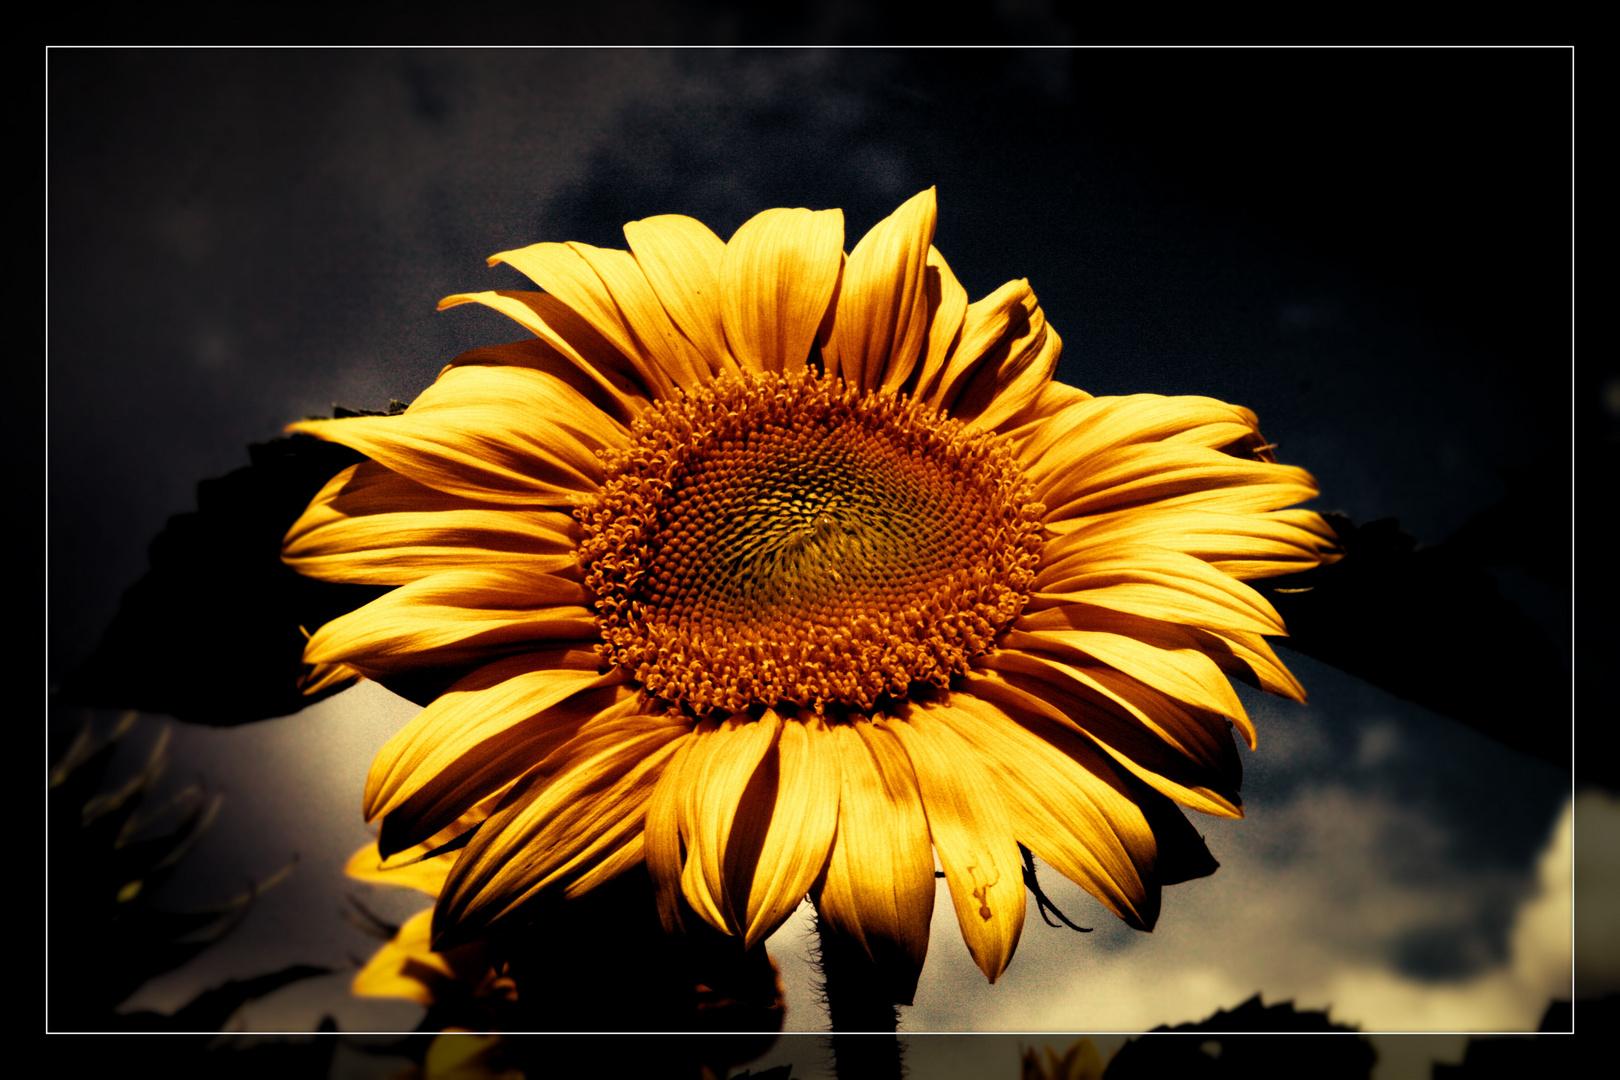 Sonnenblume August 13